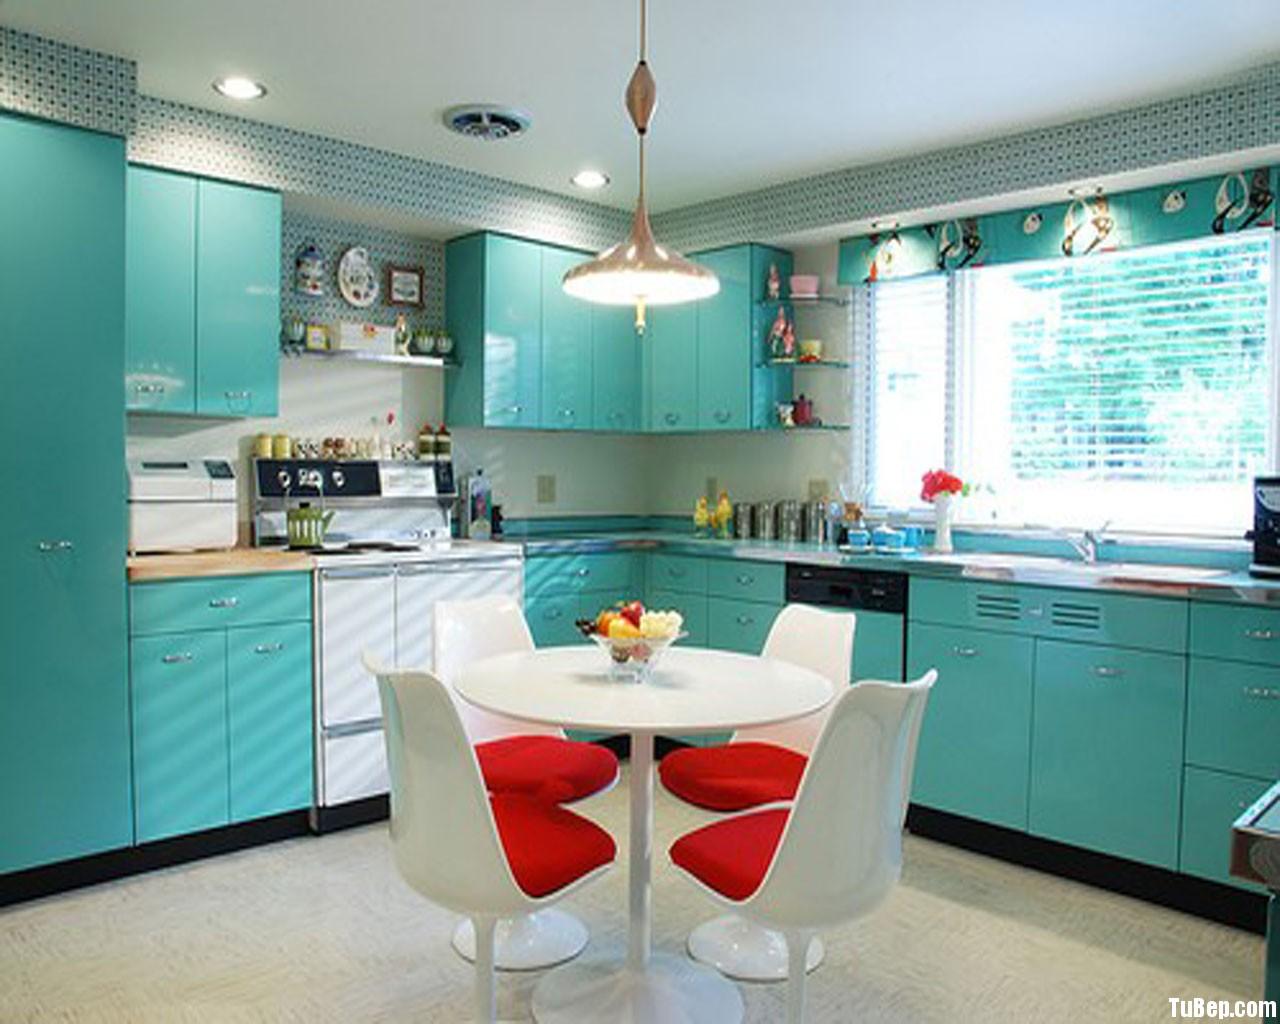 5316d07de2amiate.jpg Tủ bếp gỗ Laminate màu xanh TVT0494